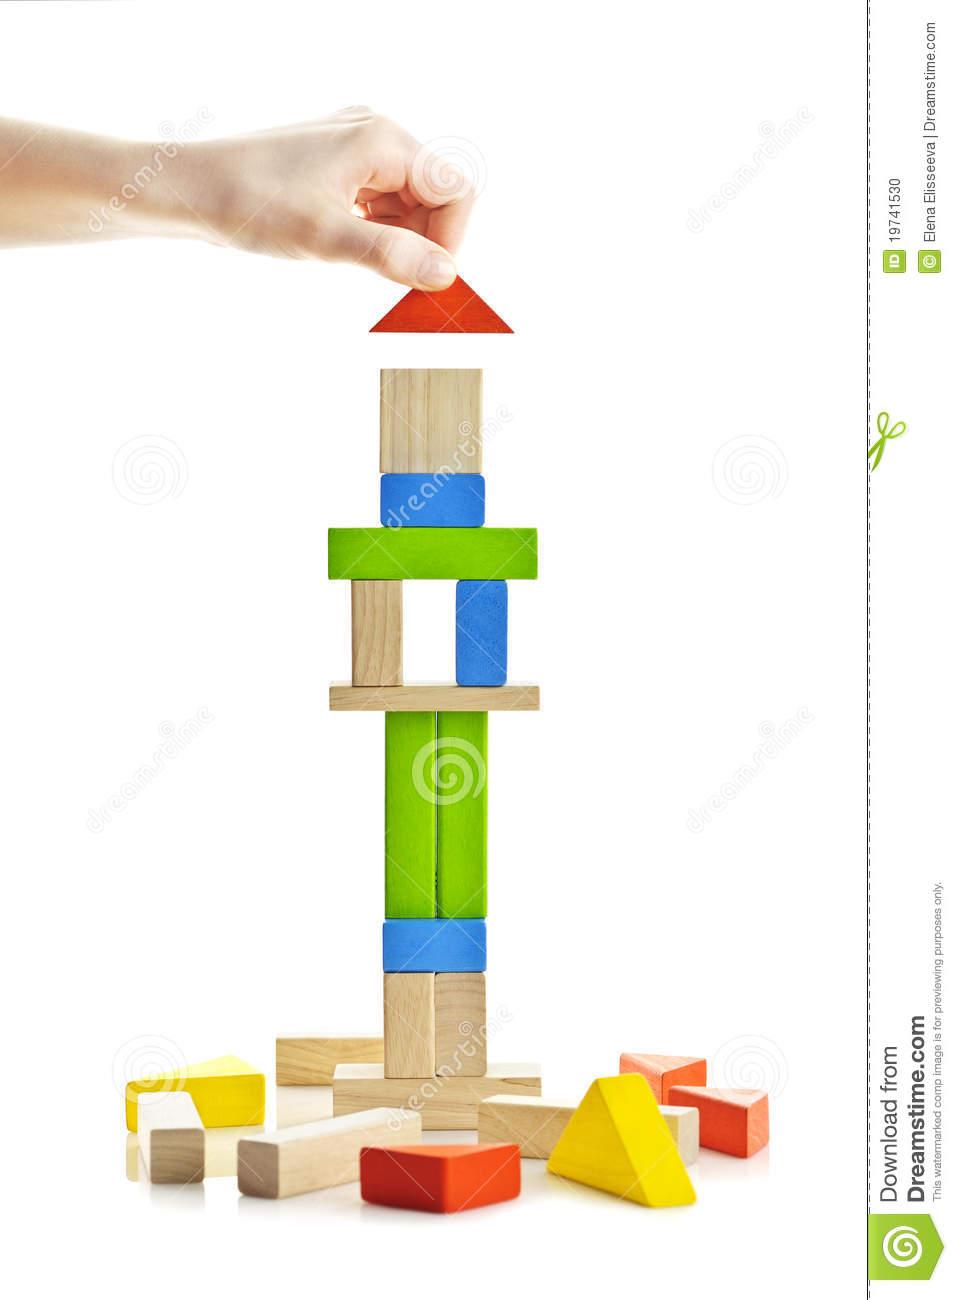 Wooden Block Tower Under Construction Stock Photo.